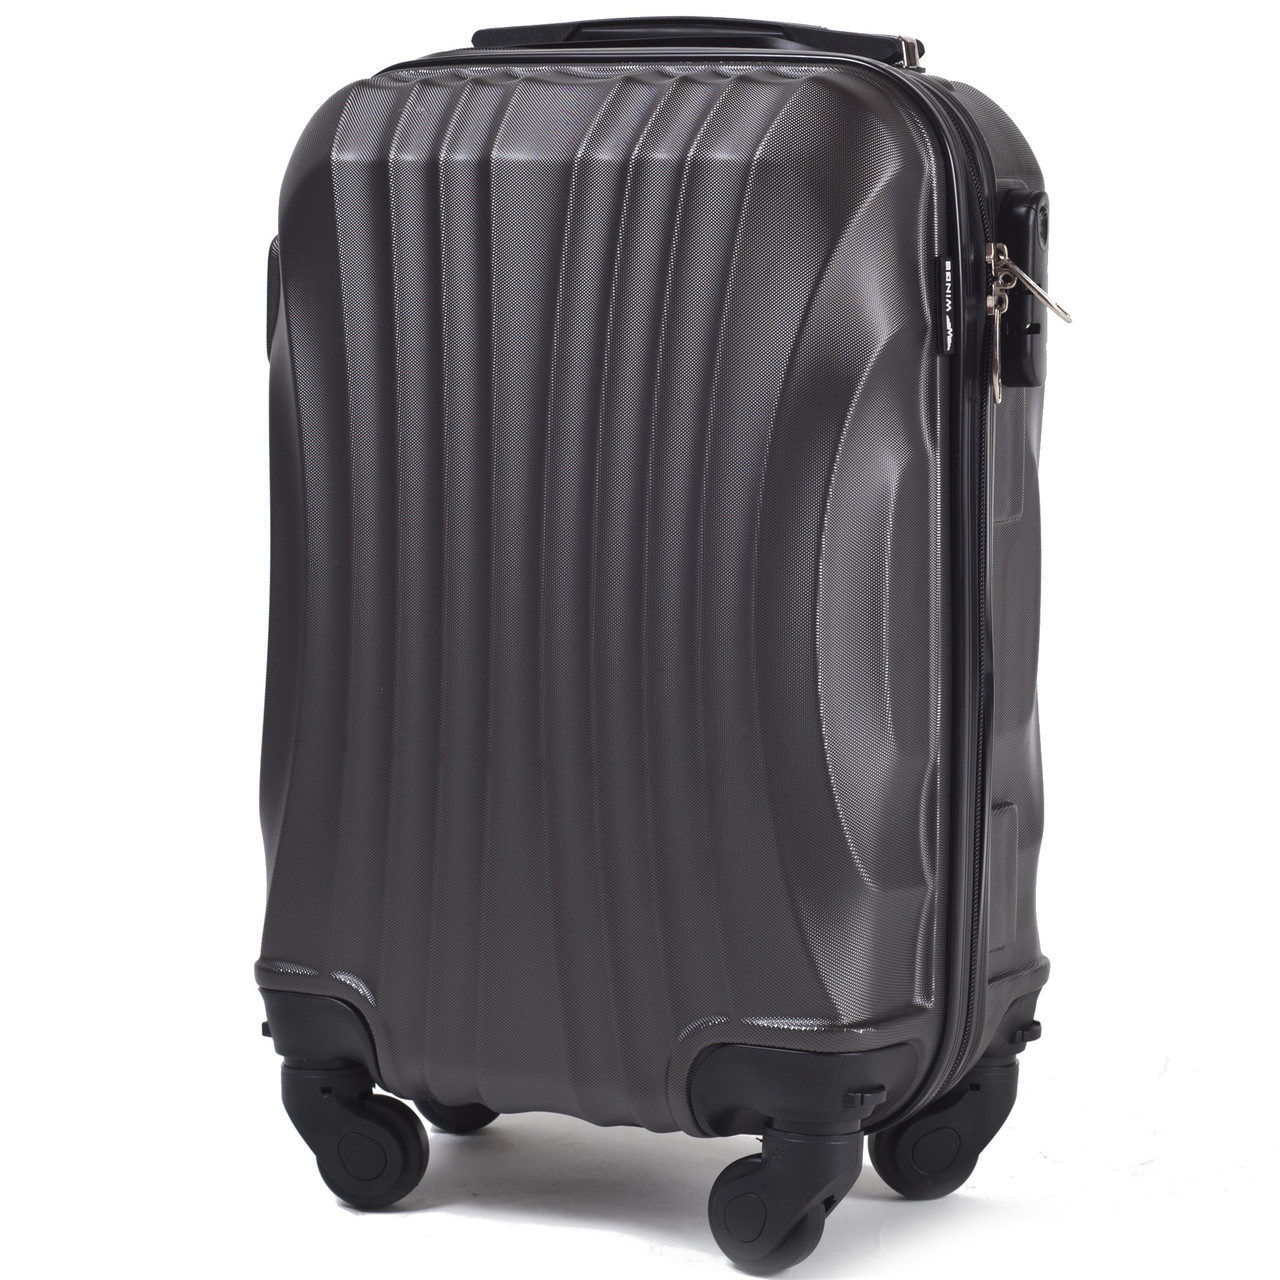 Микро пластиковый чемодан Wings 159 на 4 колесах серый